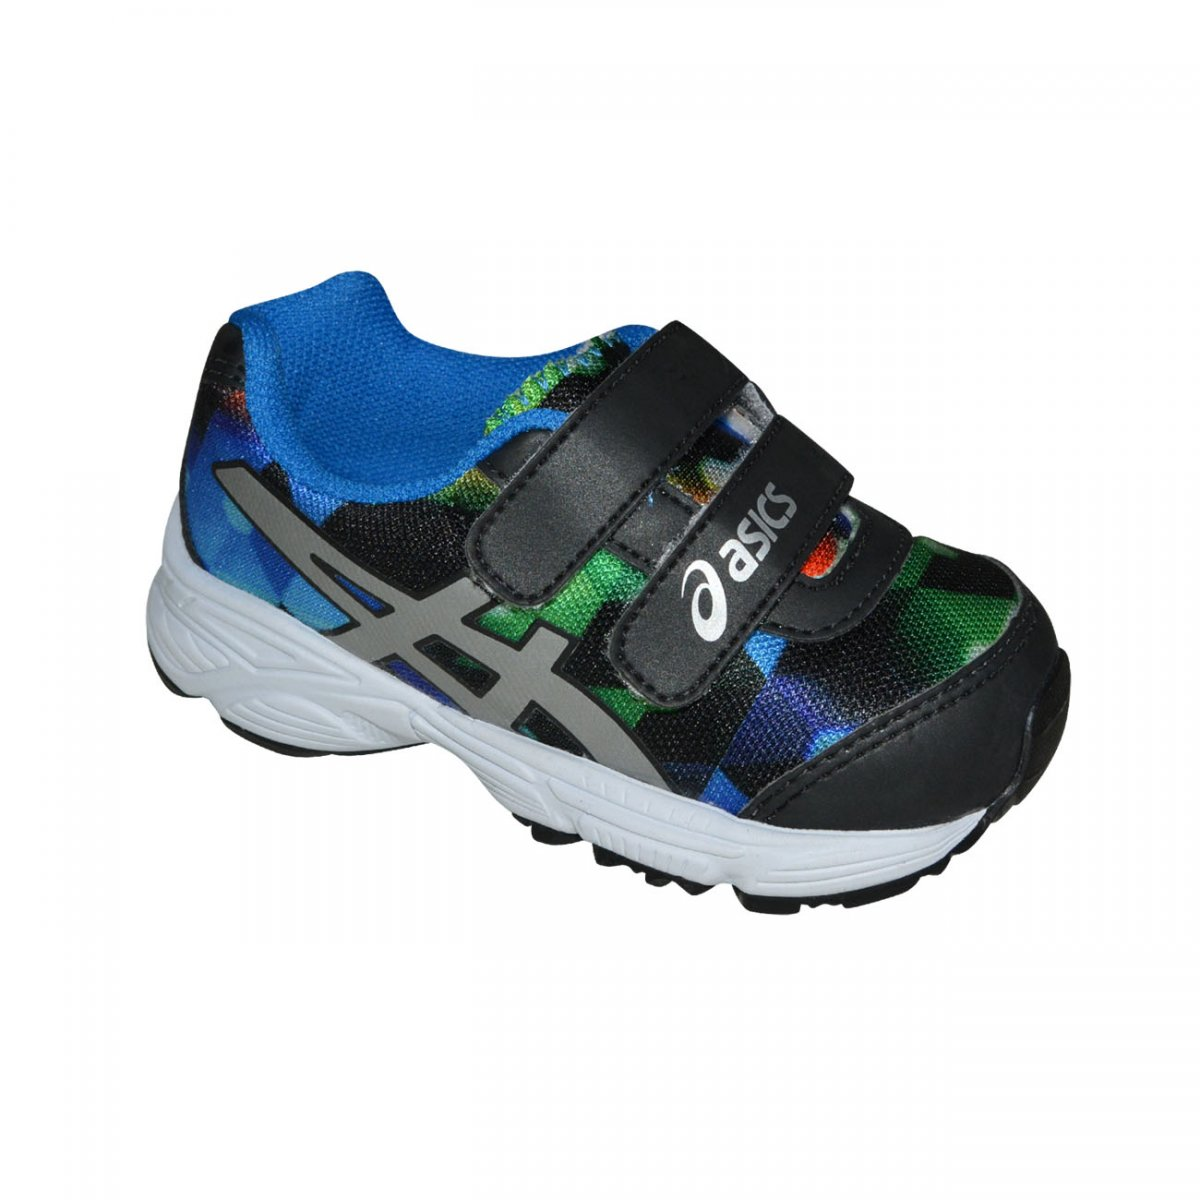 173c9033ff Tenis Asics Sugar Baby TS Infantil C003A 9093 - PRETO PRATA BRANCO -  Chuteira Nike